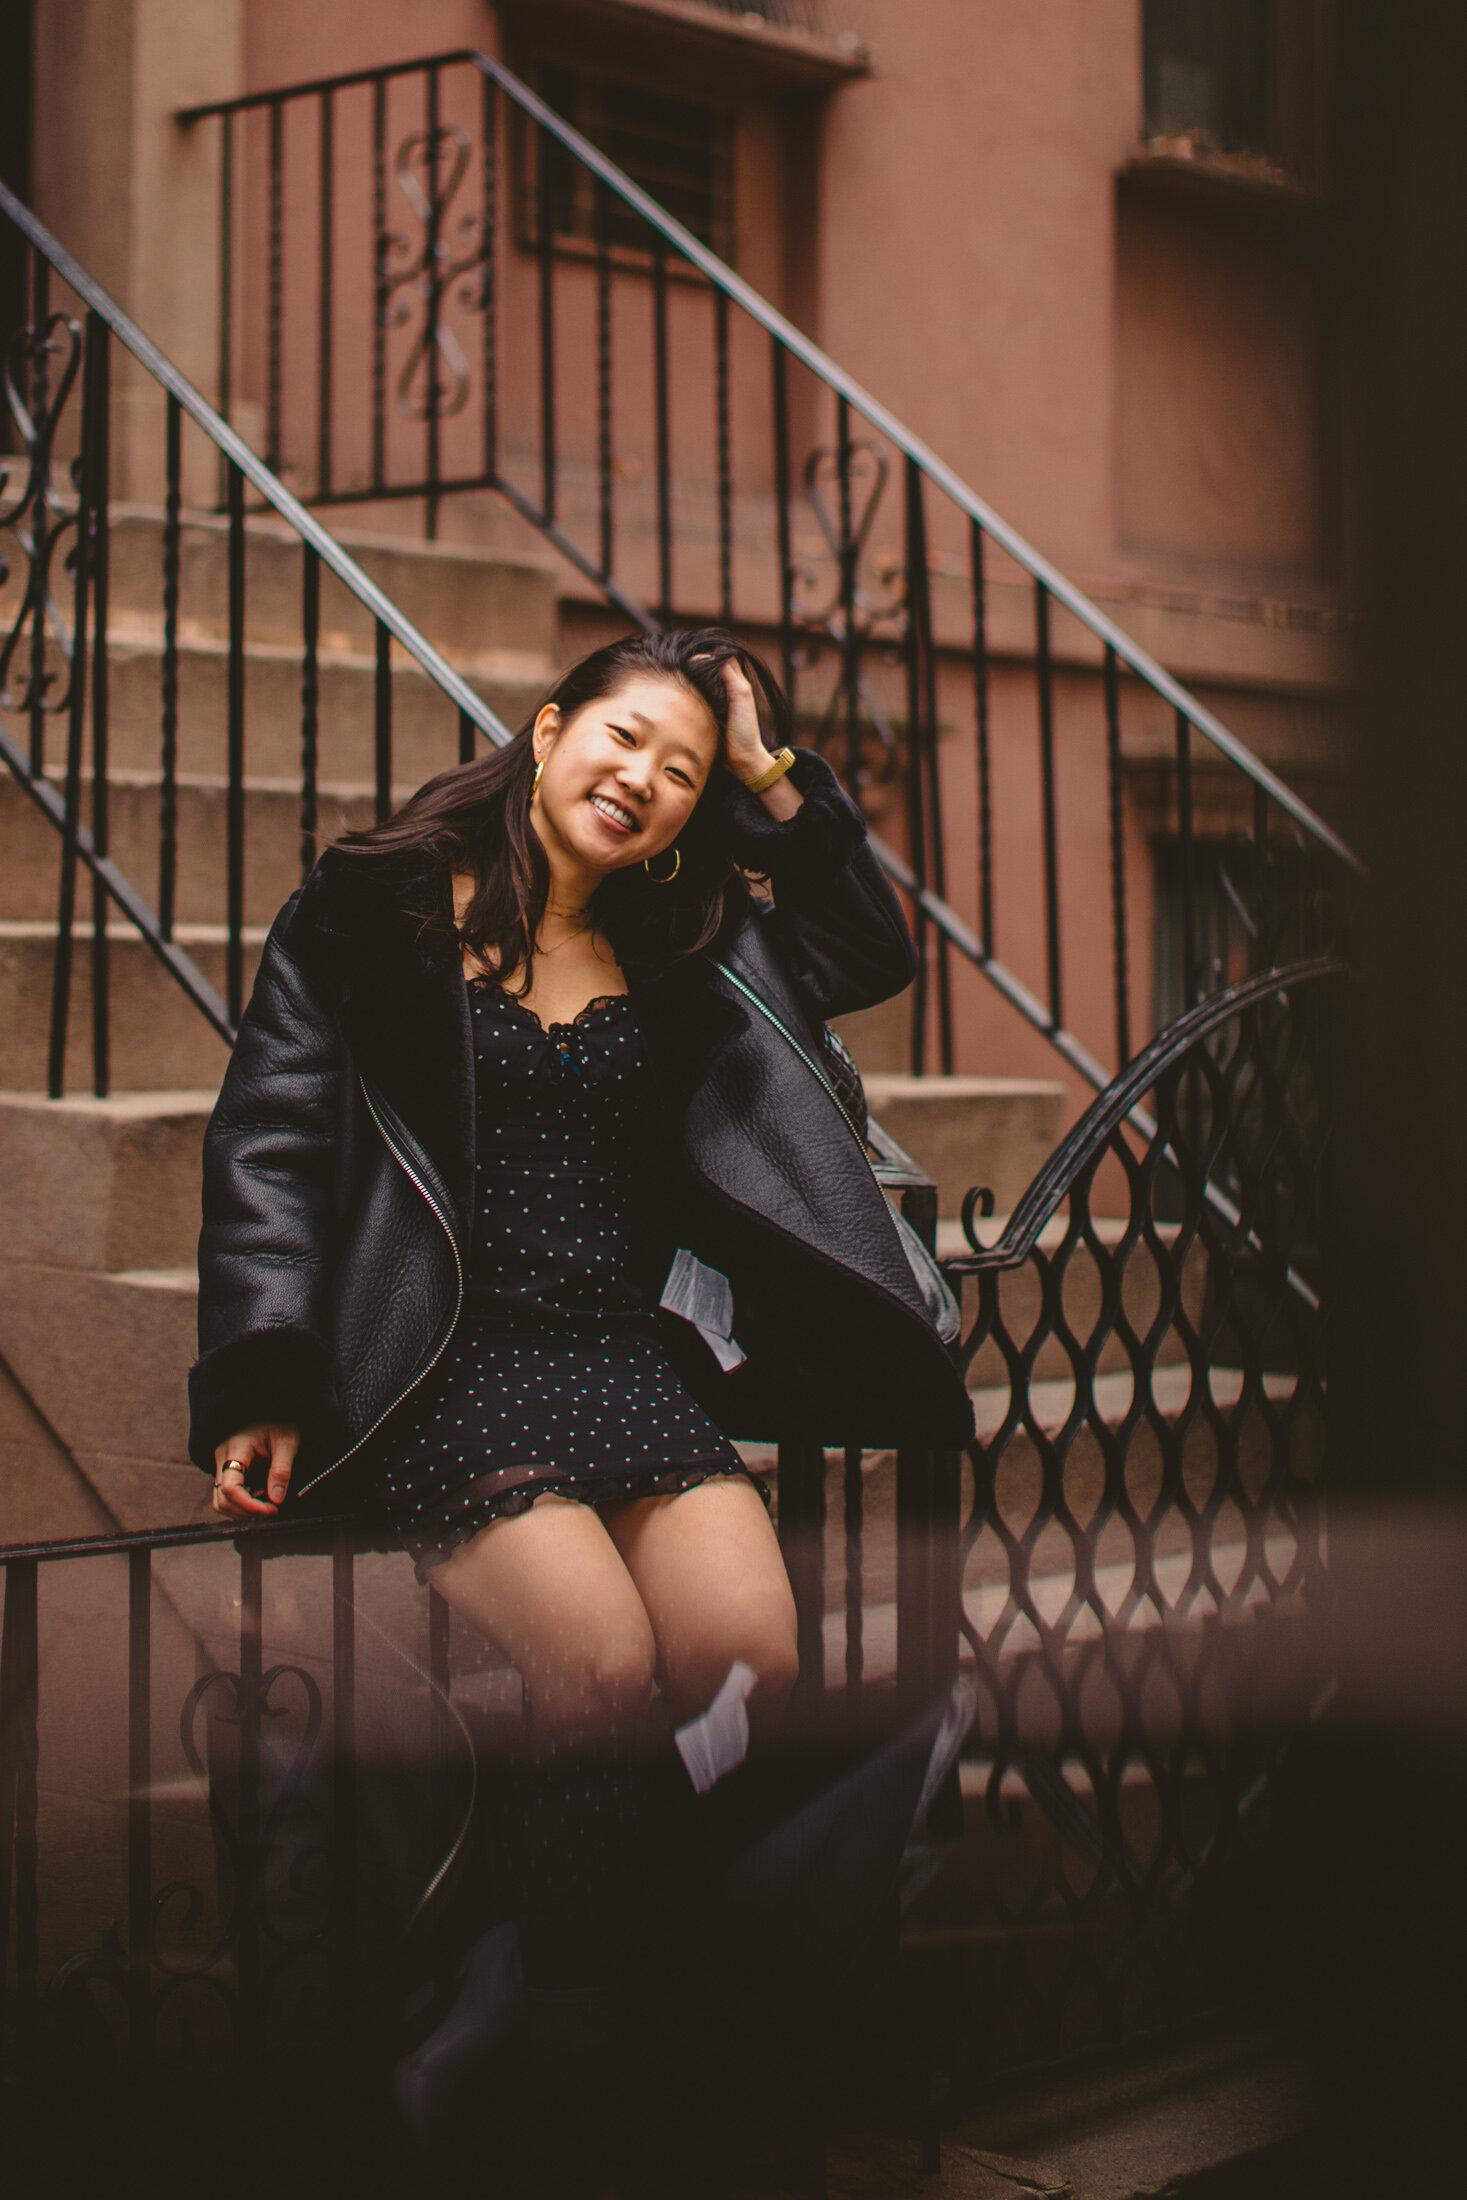 2020-01-27 BLOG Gwen Grace - Fashion - New York City, New York - Jack Robert Photography-3.jpg